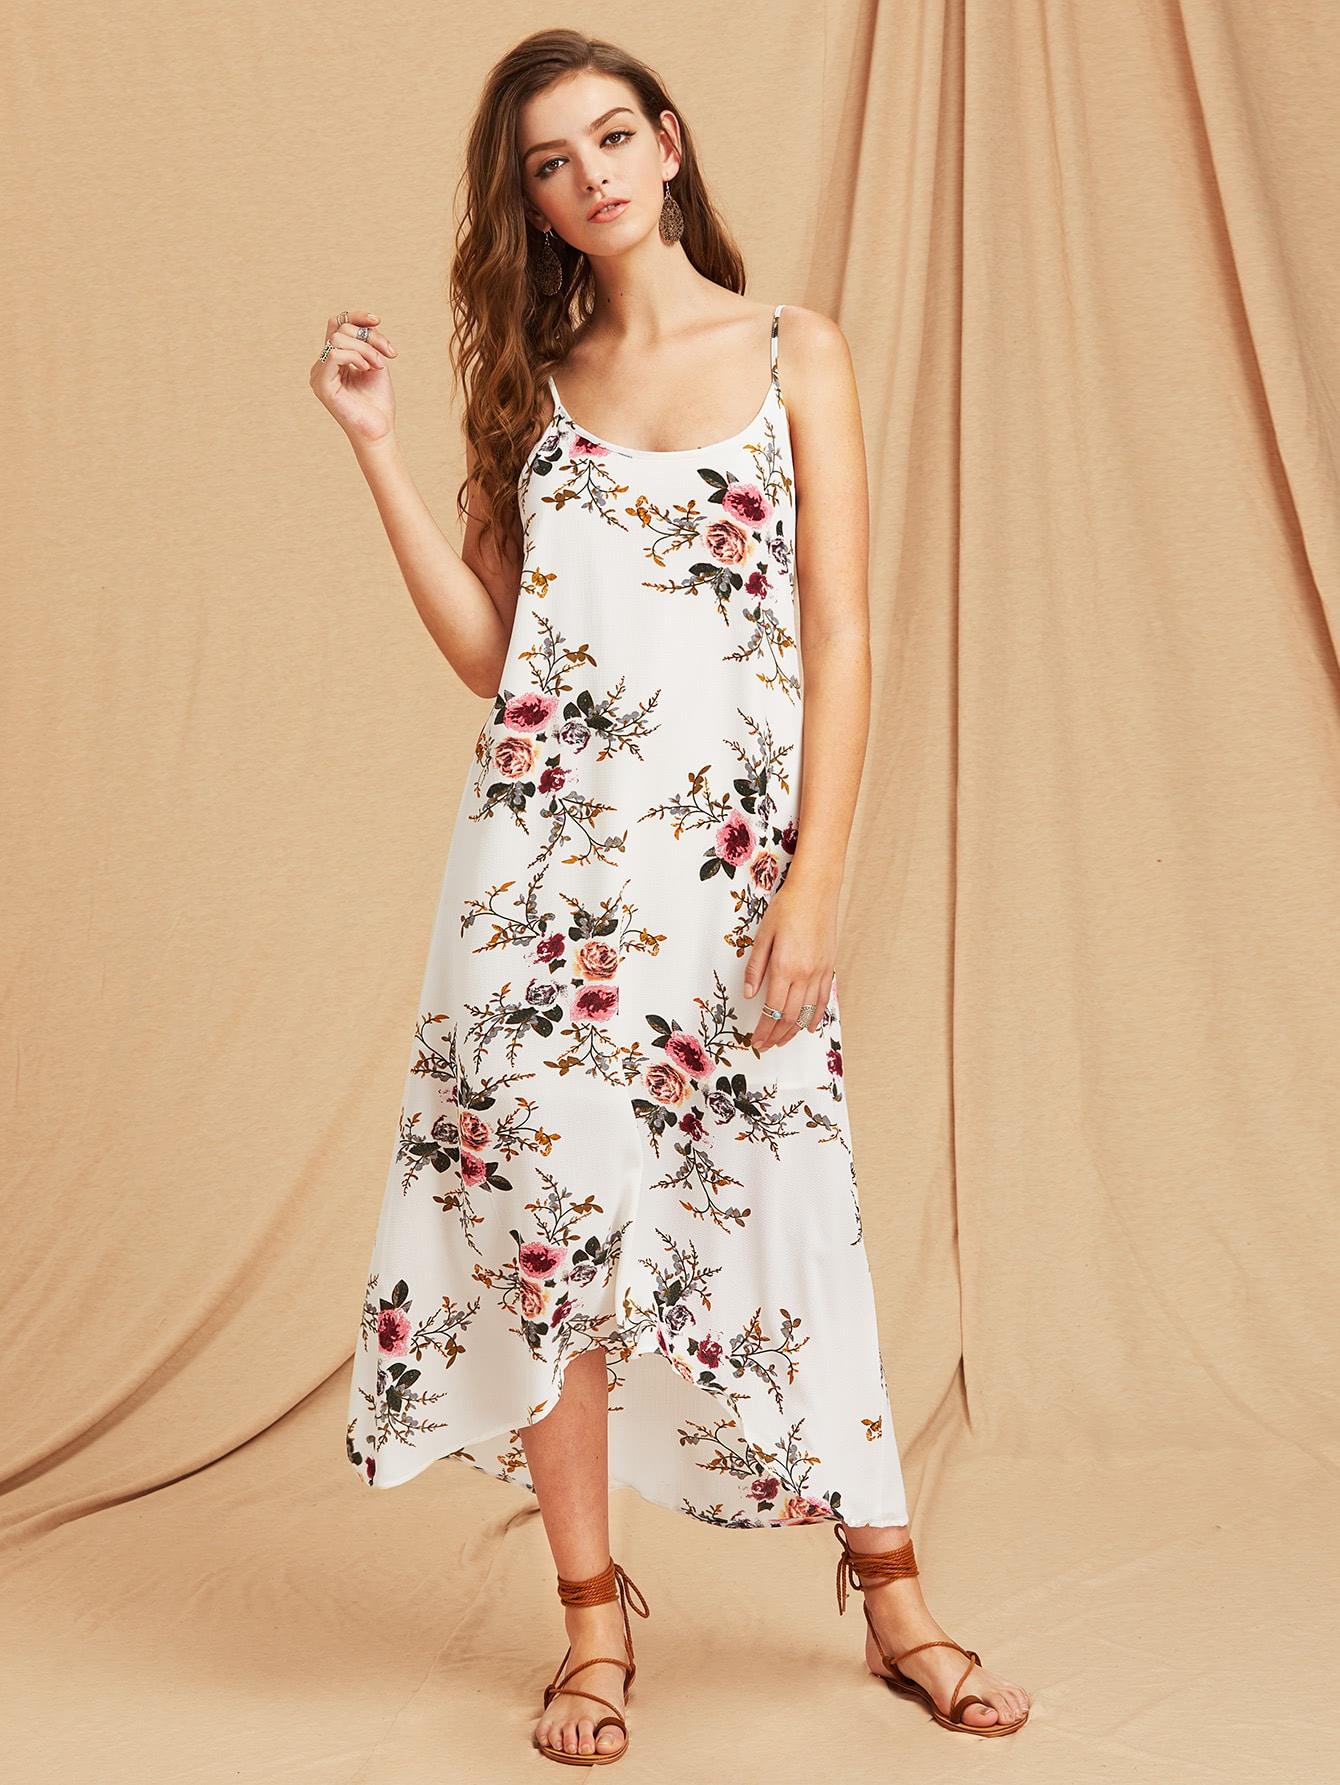 Botanical Print Scoop Back High Low Flowy Cami Dress